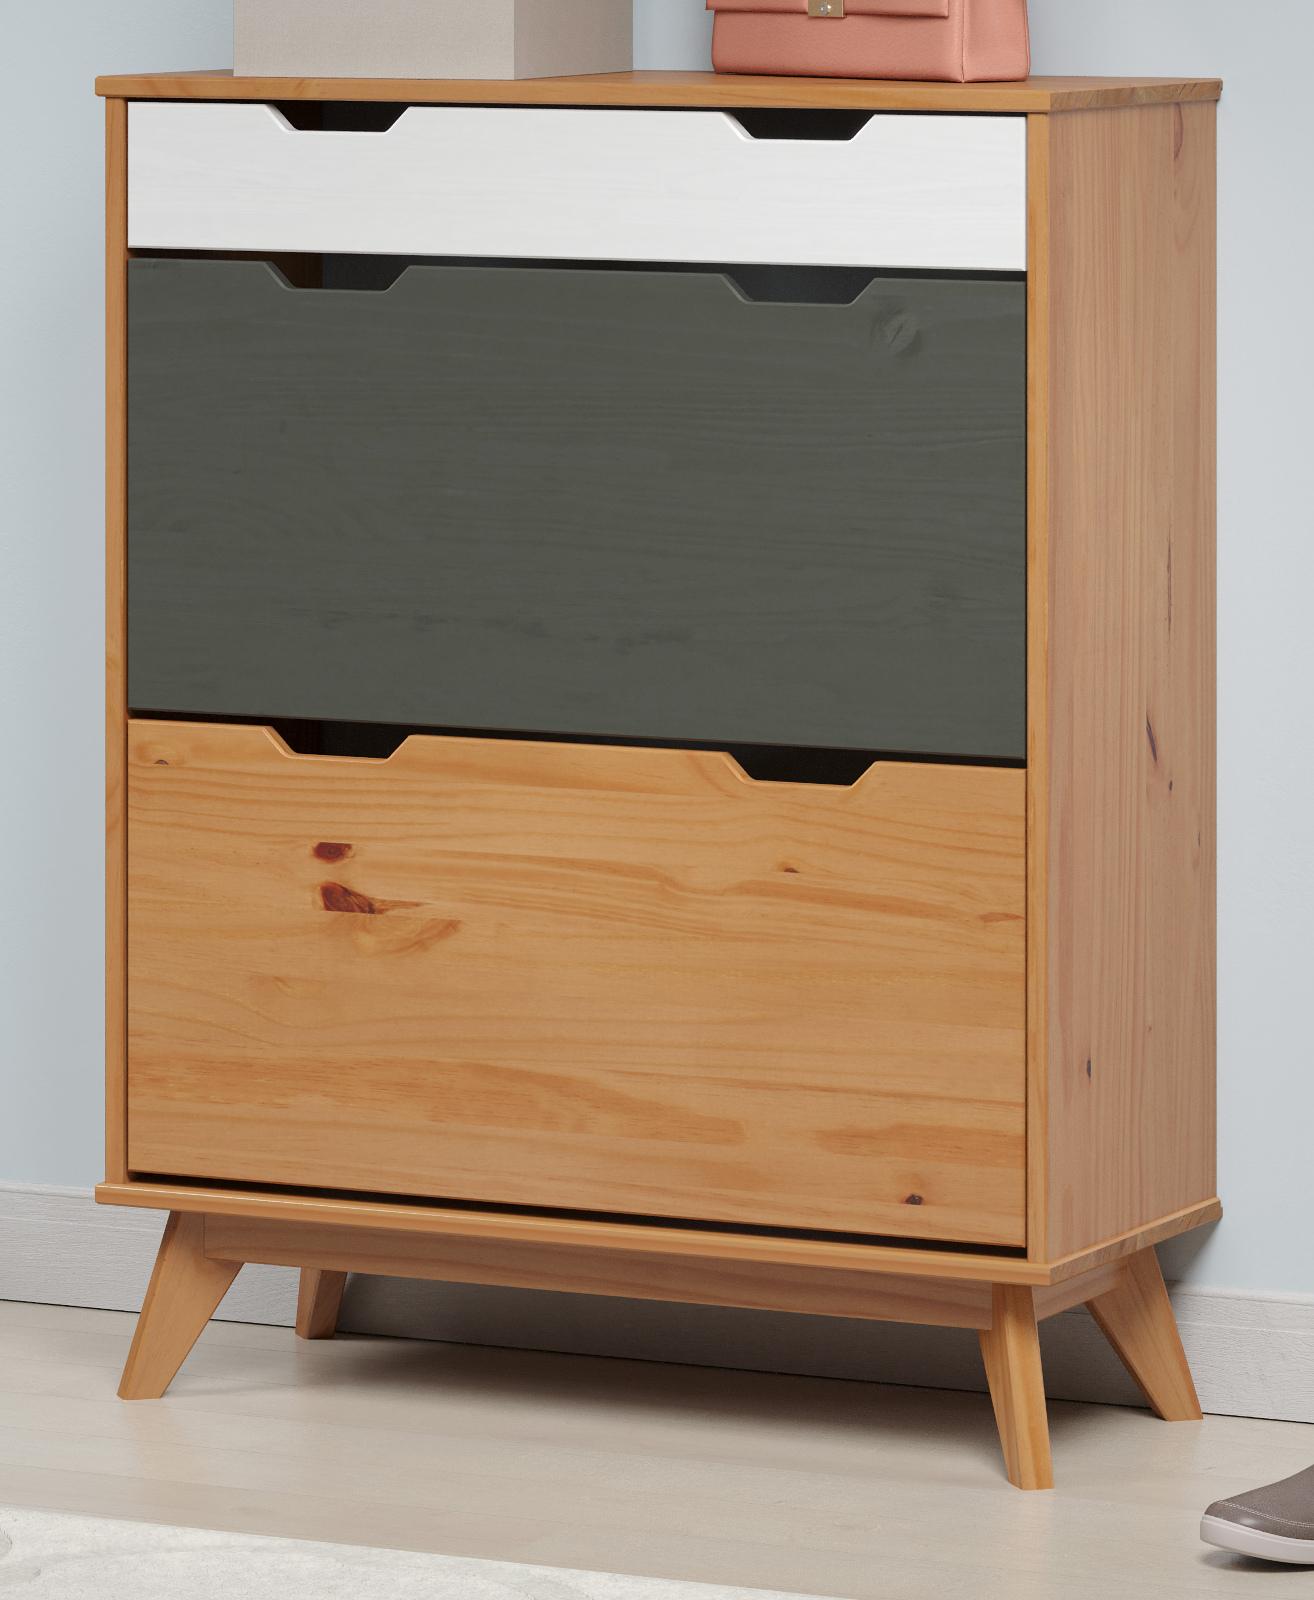 wickelkommode eiche s gerau dekor emija4 designerm bel moderne m bel owl. Black Bedroom Furniture Sets. Home Design Ideas